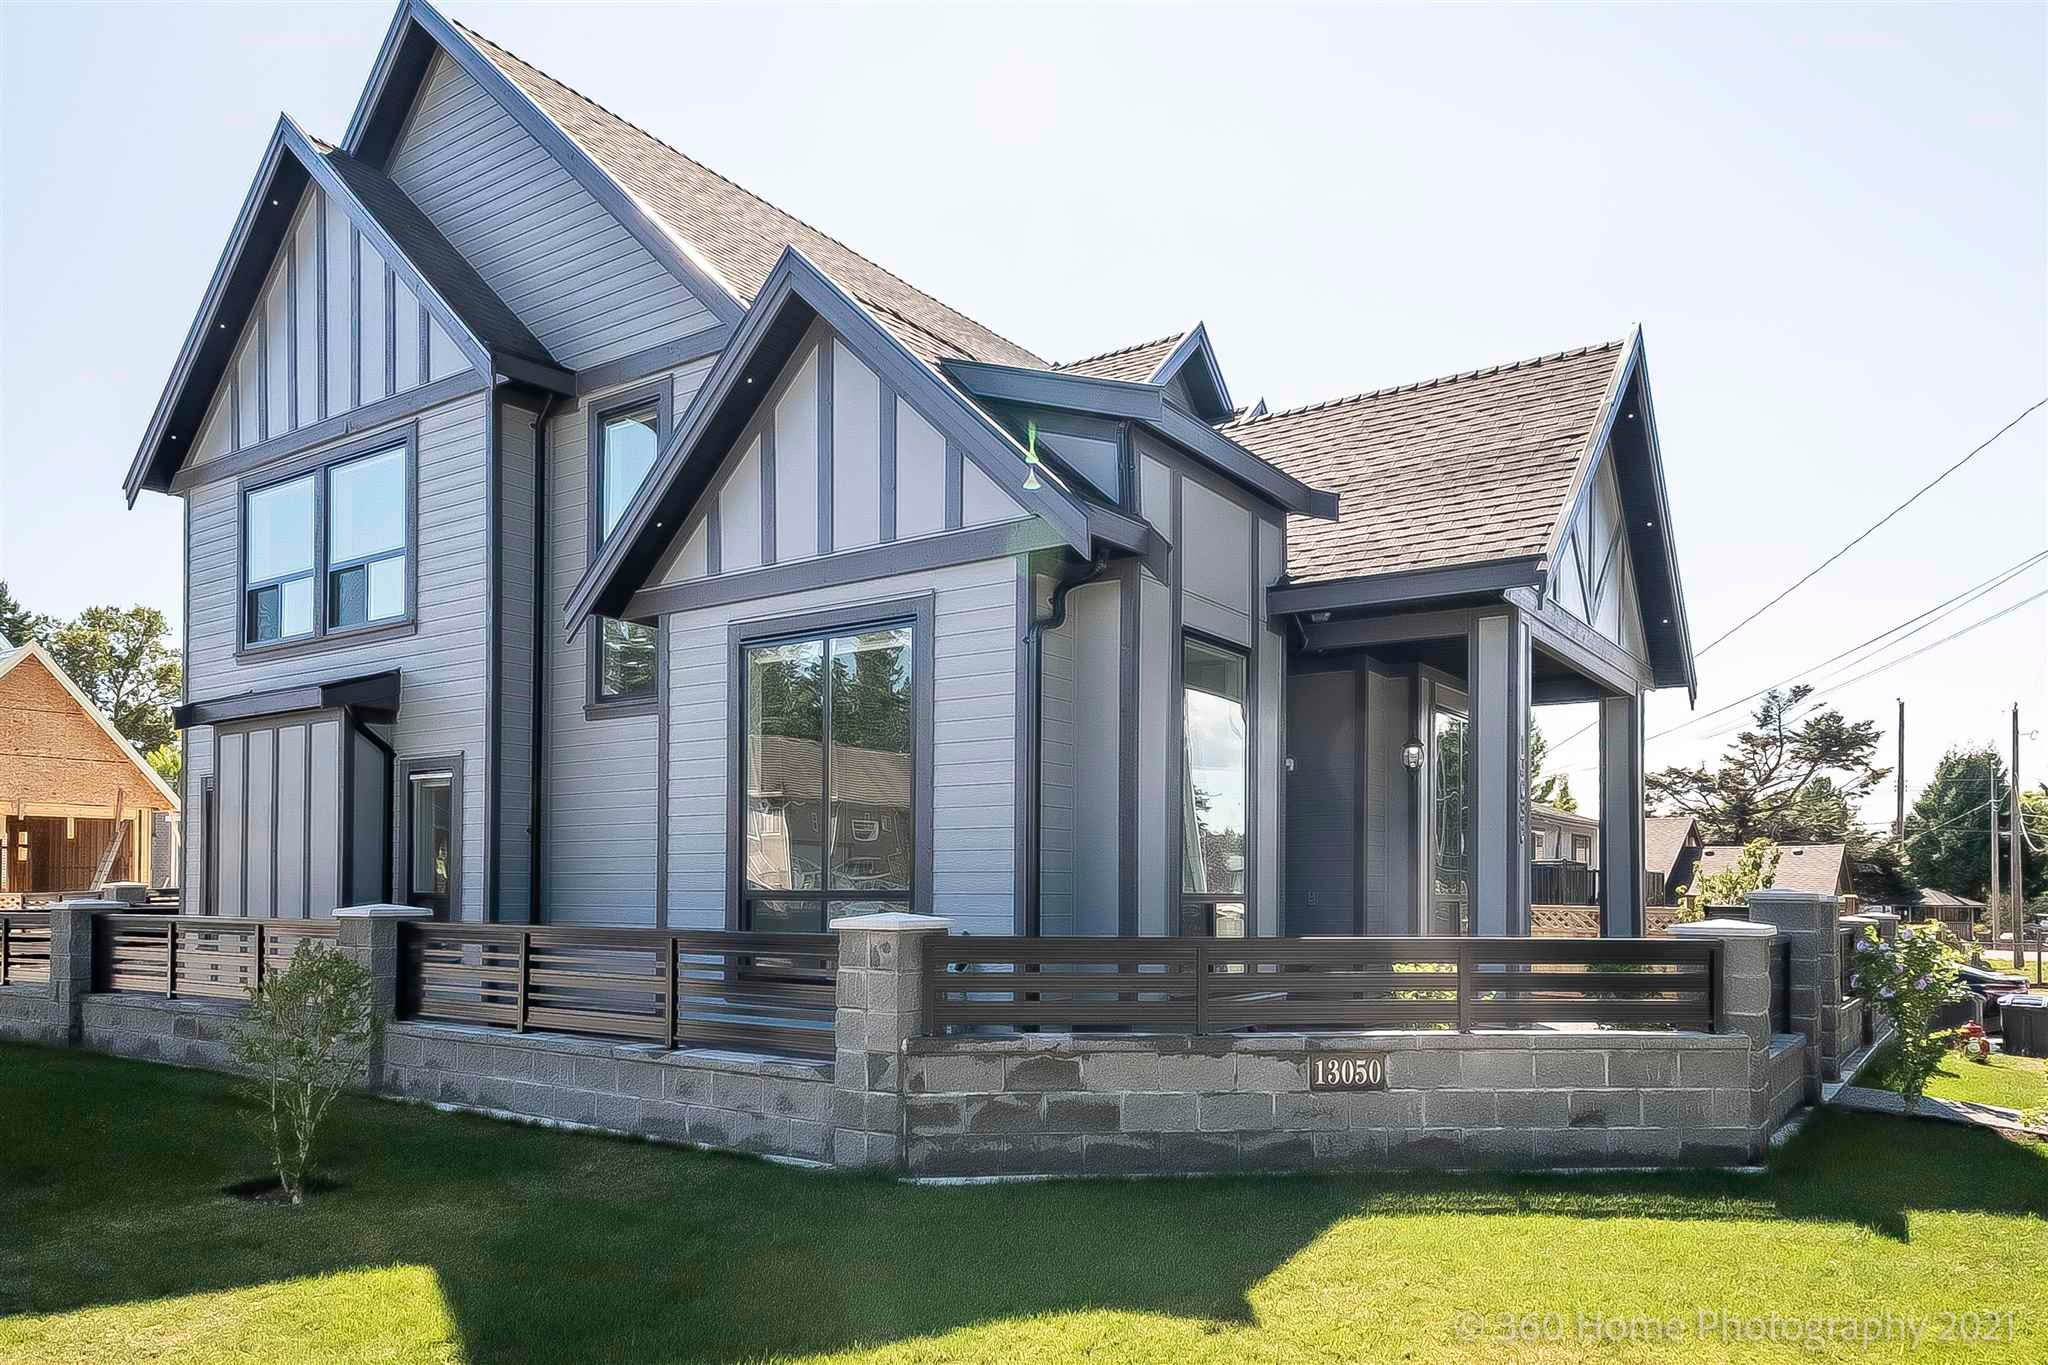 13050 101B AVENUE - Cedar Hills House/Single Family for sale, 5 Bedrooms (R2602208) - #2